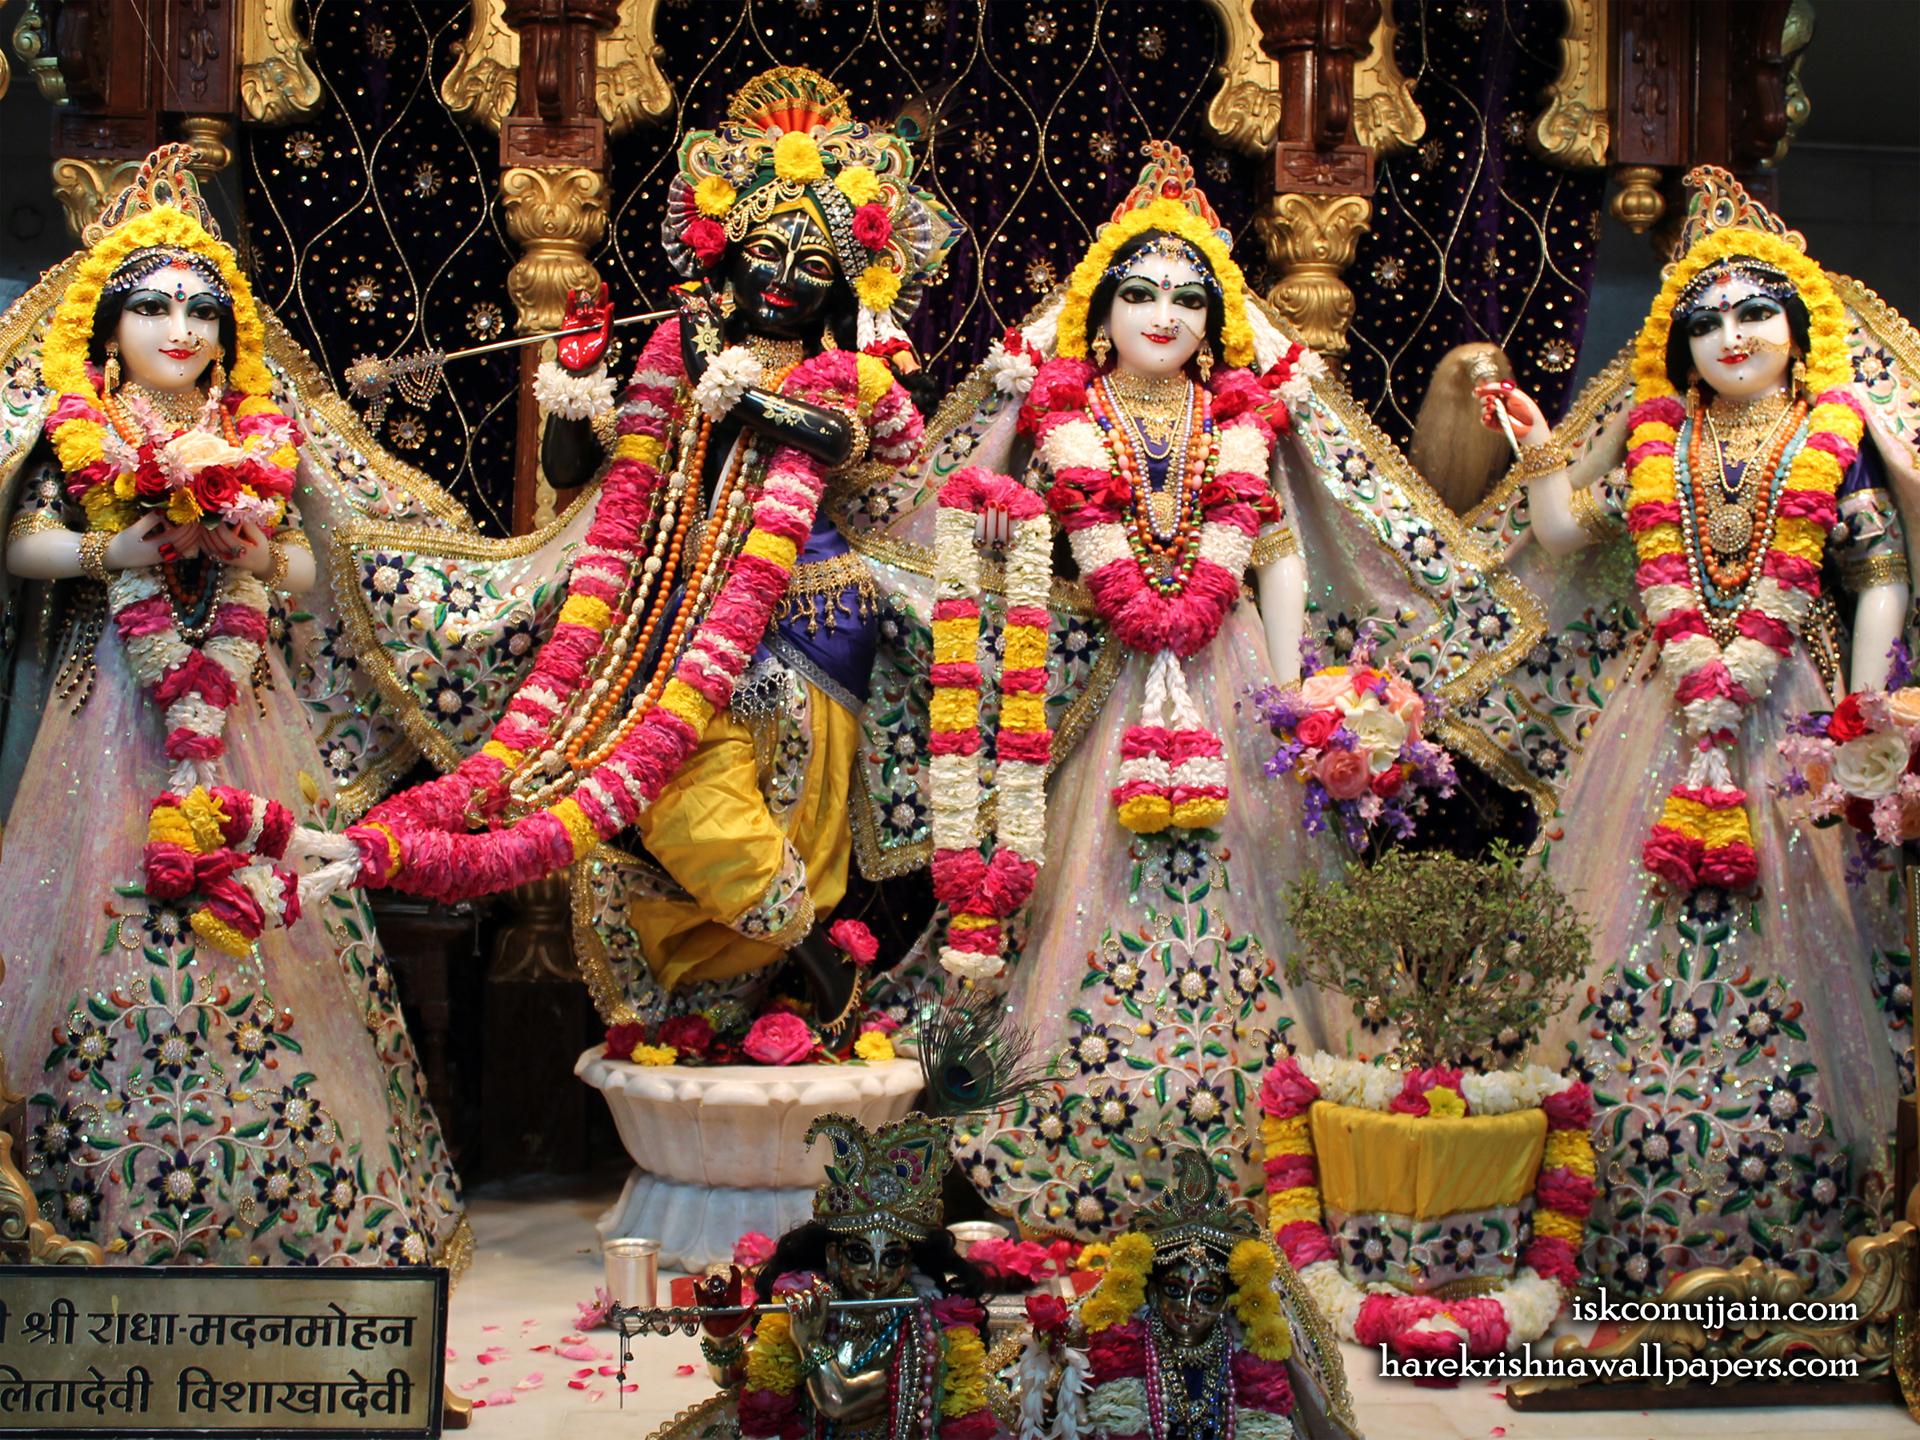 Sri Sri Radha Madanmohan Lalita Vishakha Wallpaper (001) Size 1920x1440 Download